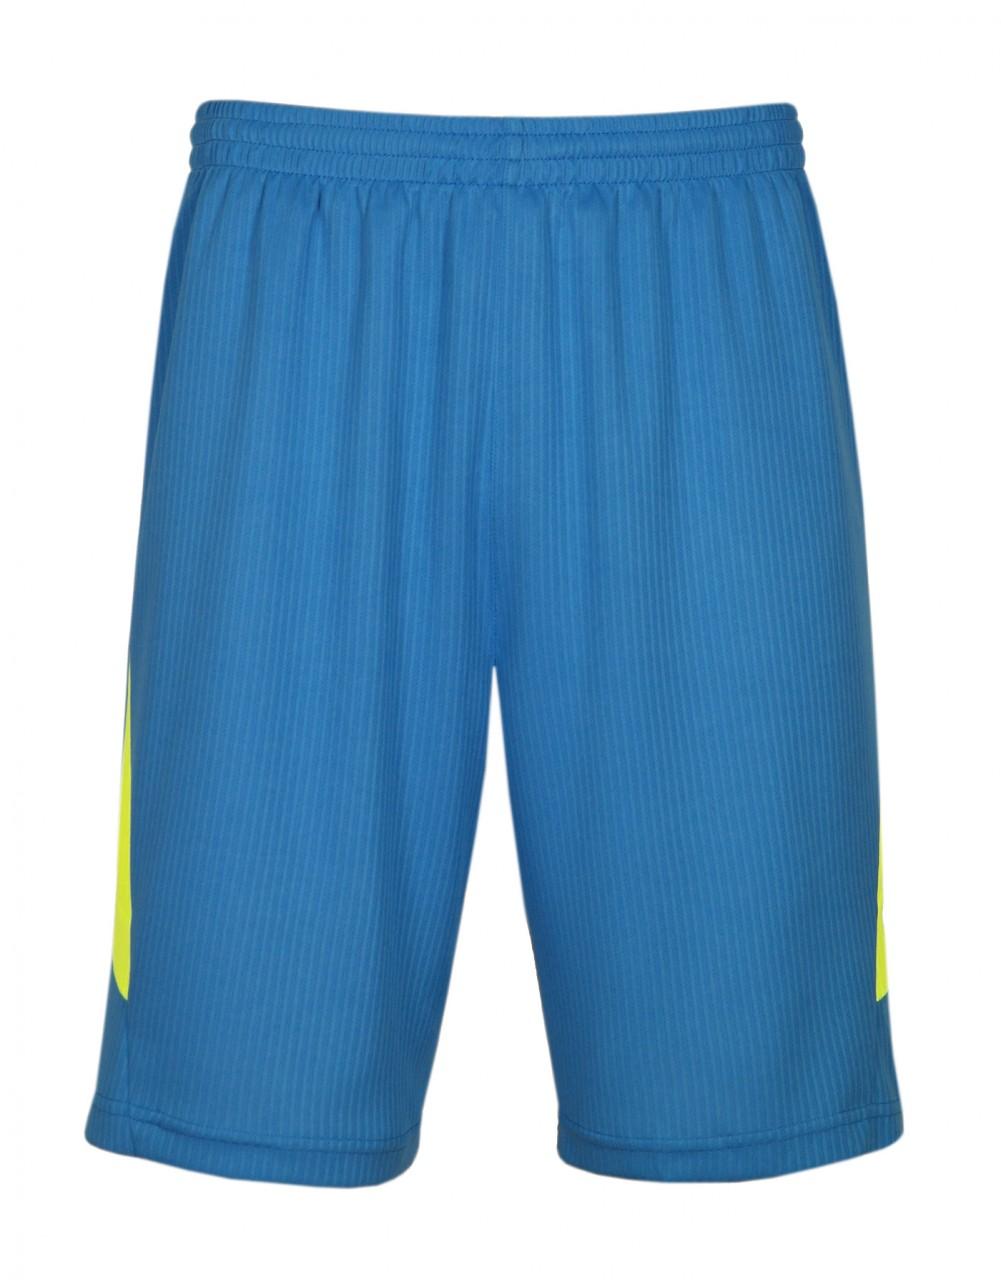 EPISTER Badehose, Sport- Badeshorts Bermuda - Blau